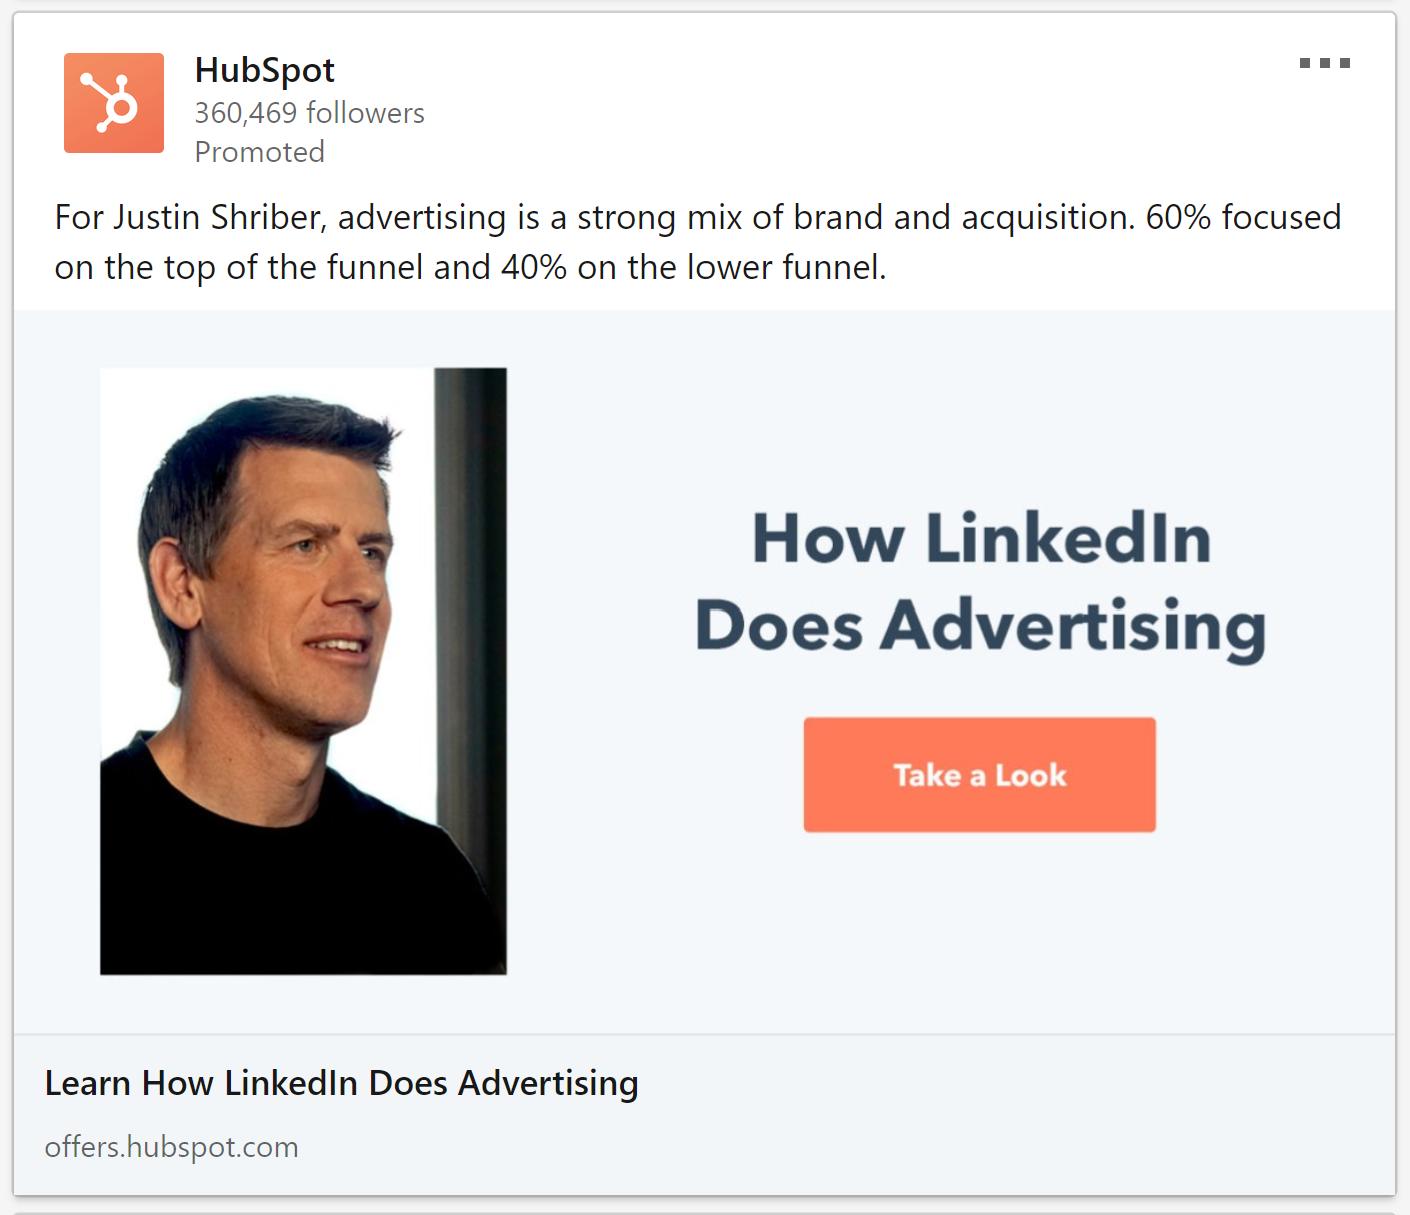 HubSpot focuses on an insider testimonial on LinkedIn.